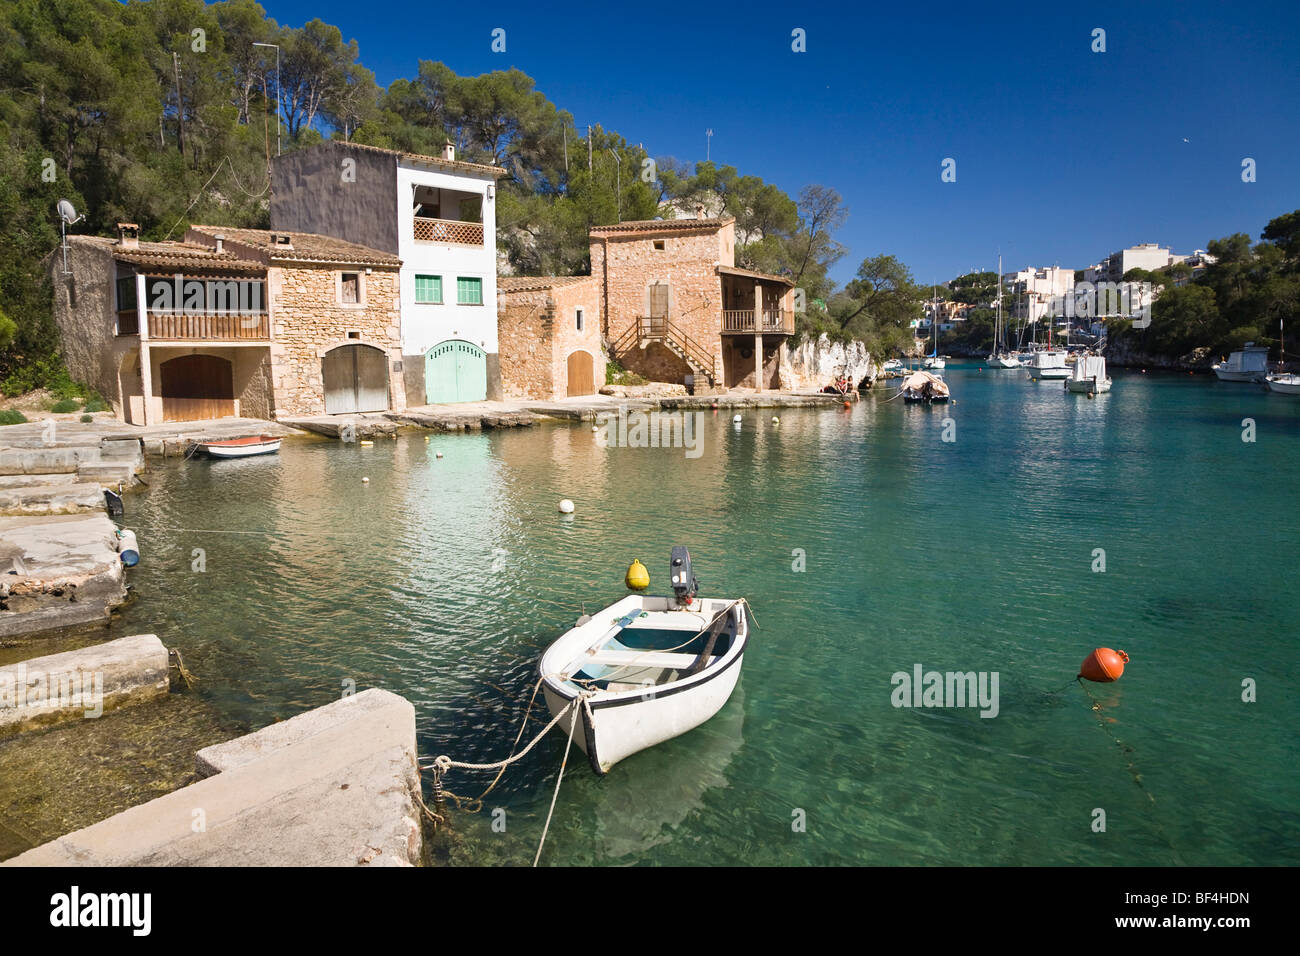 Harbour of Cala Figuera, Mallorca, Majorca, Balearic Islands, Mediterranean Sea, Spain, Europe Stock Photo